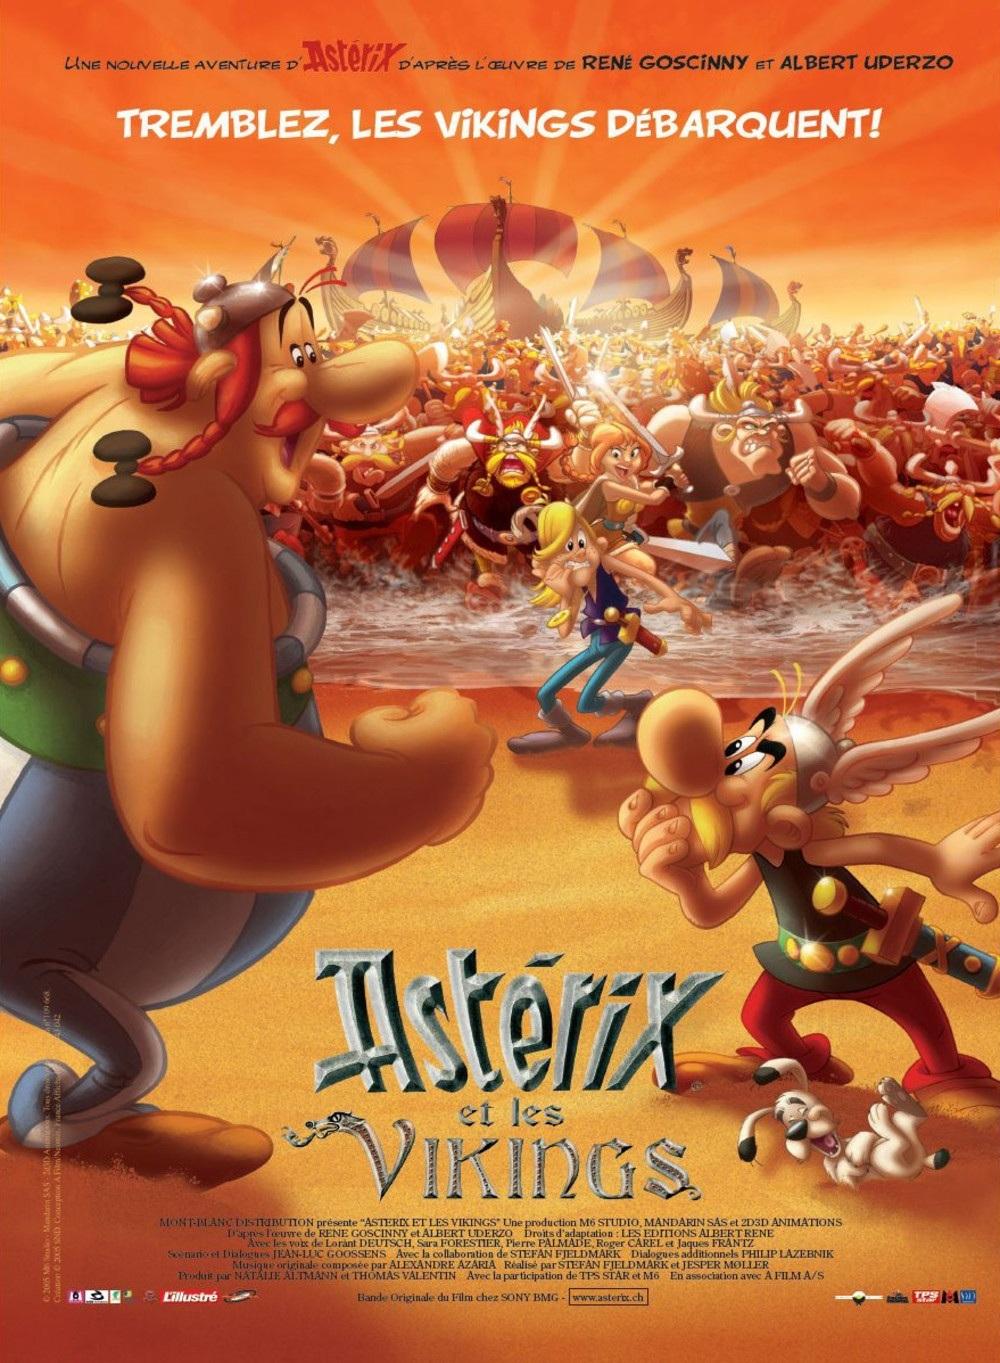 دانلود زیرنویس فارسی فیلم Astérix et les Vikings